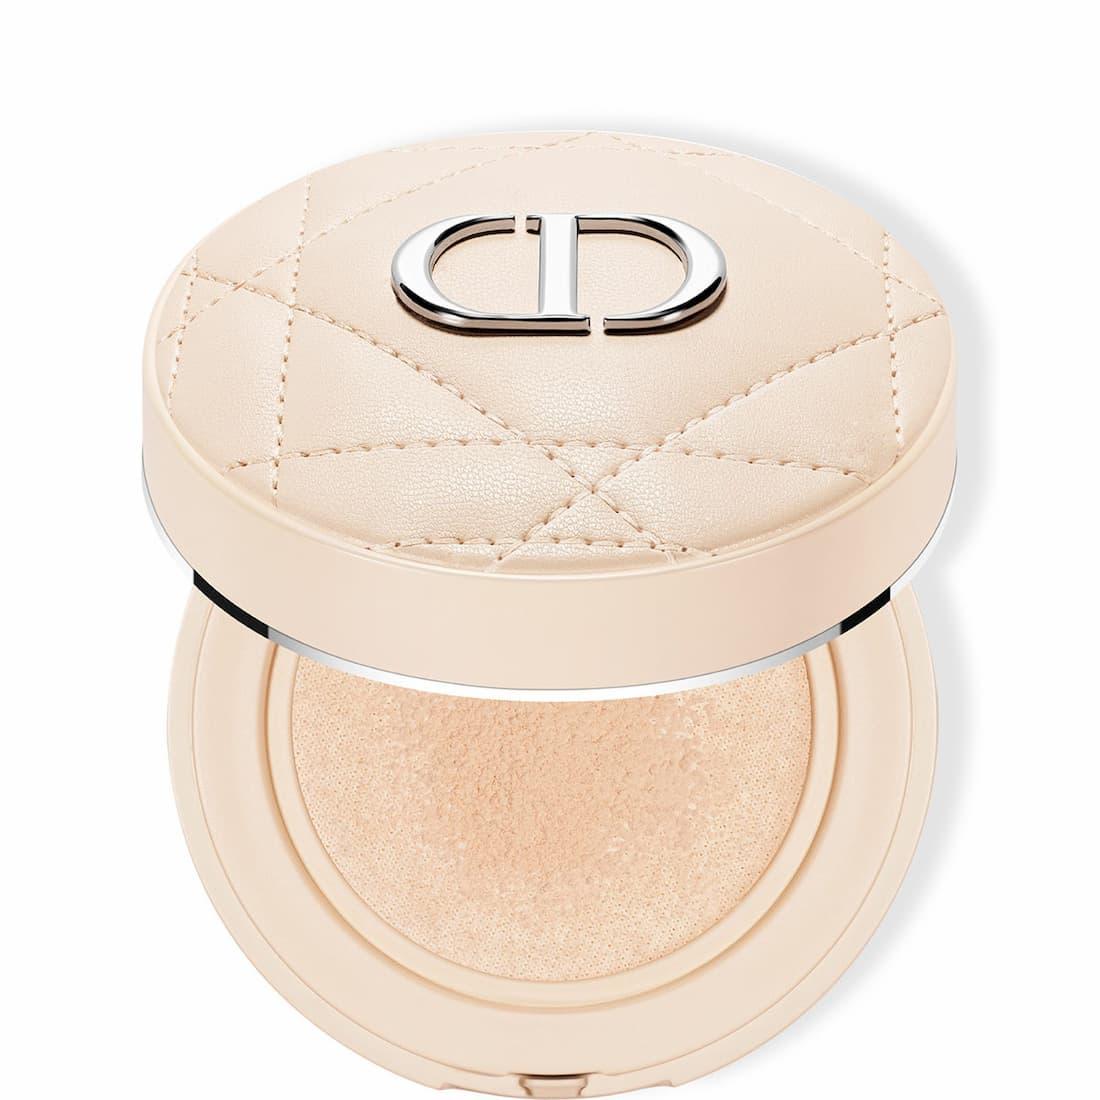 Dior Forever Cushion Powder - Poudre libre